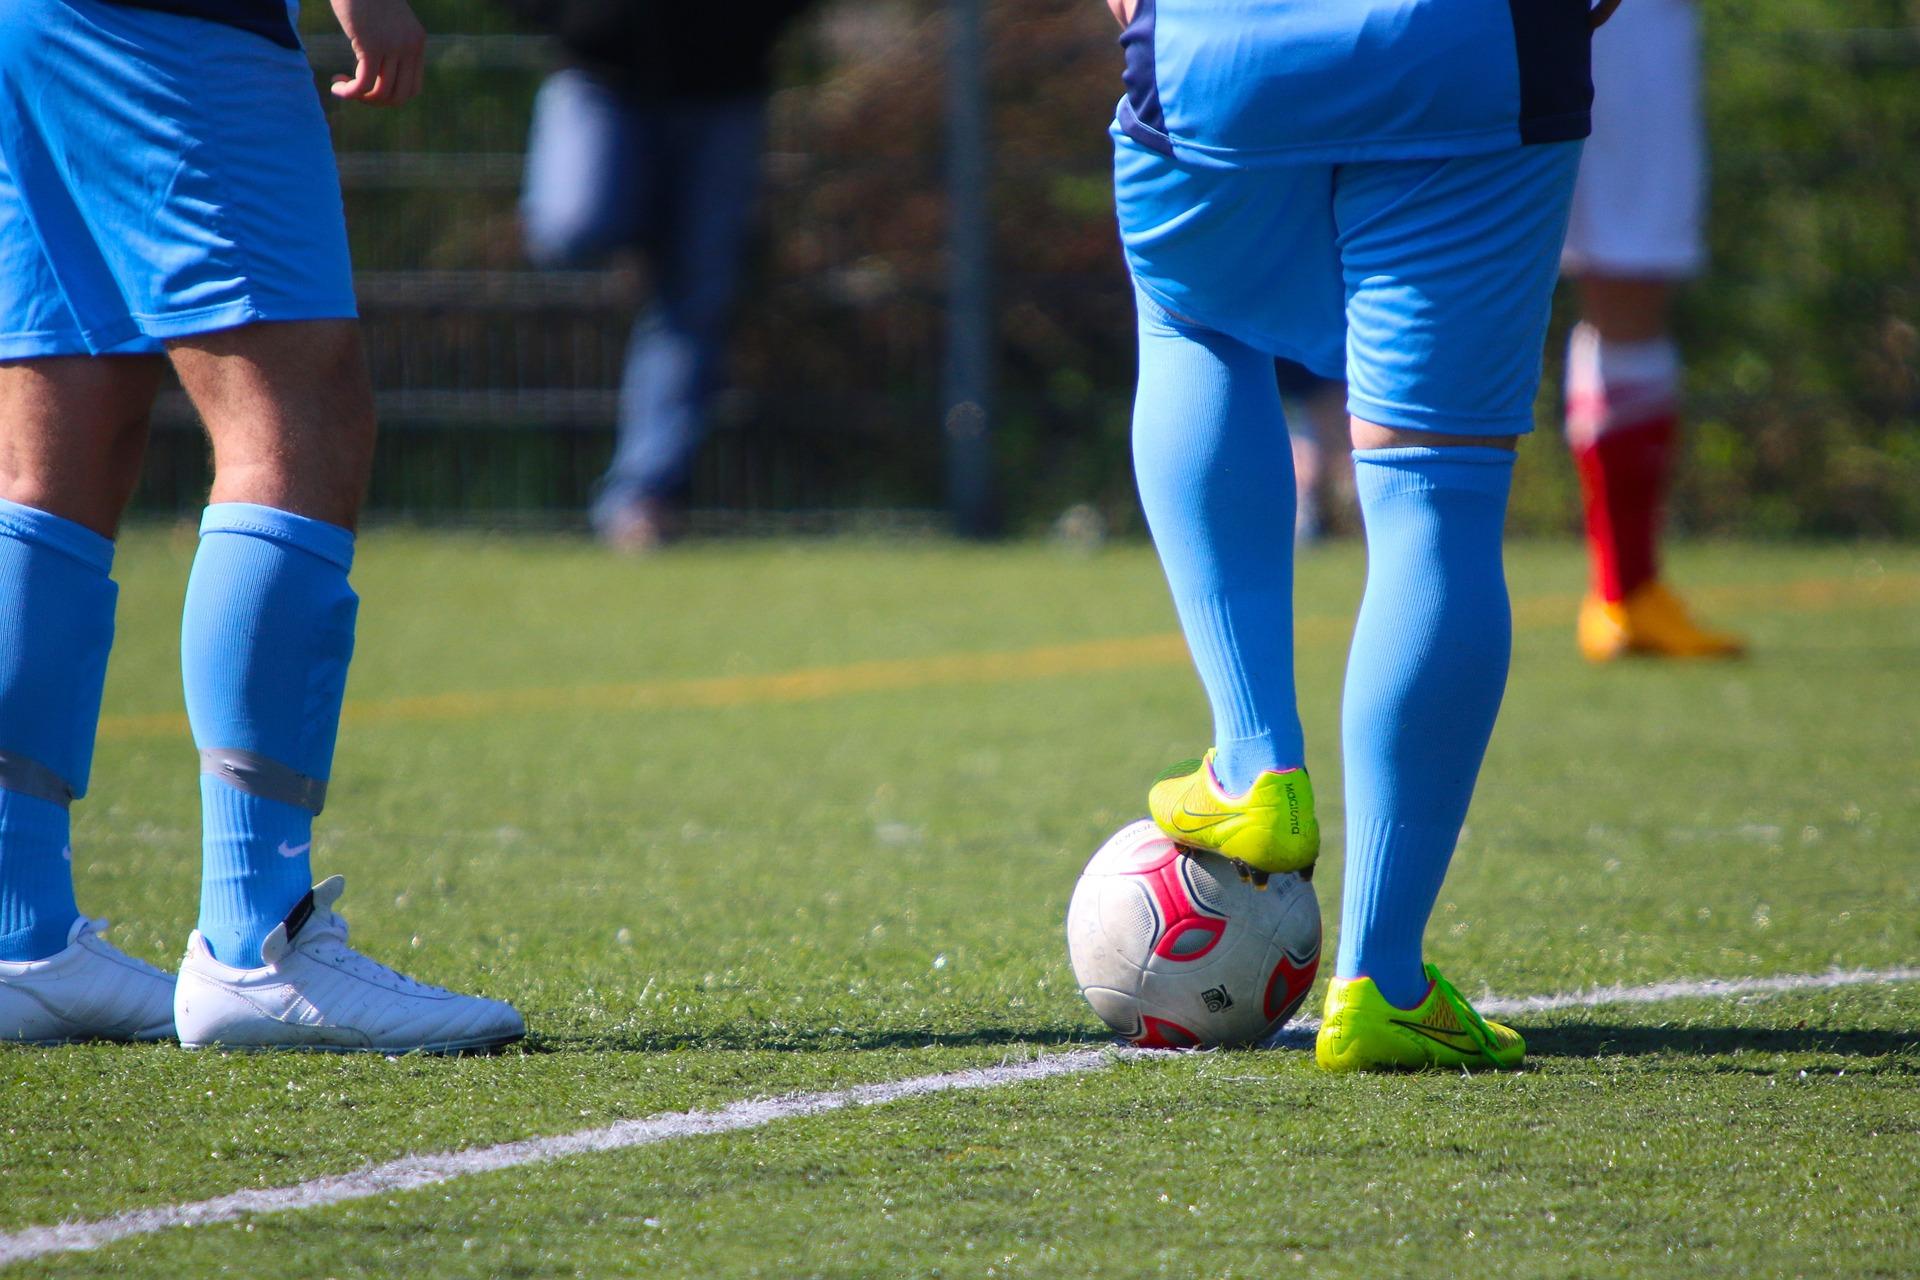 football-730418_1920.jpg